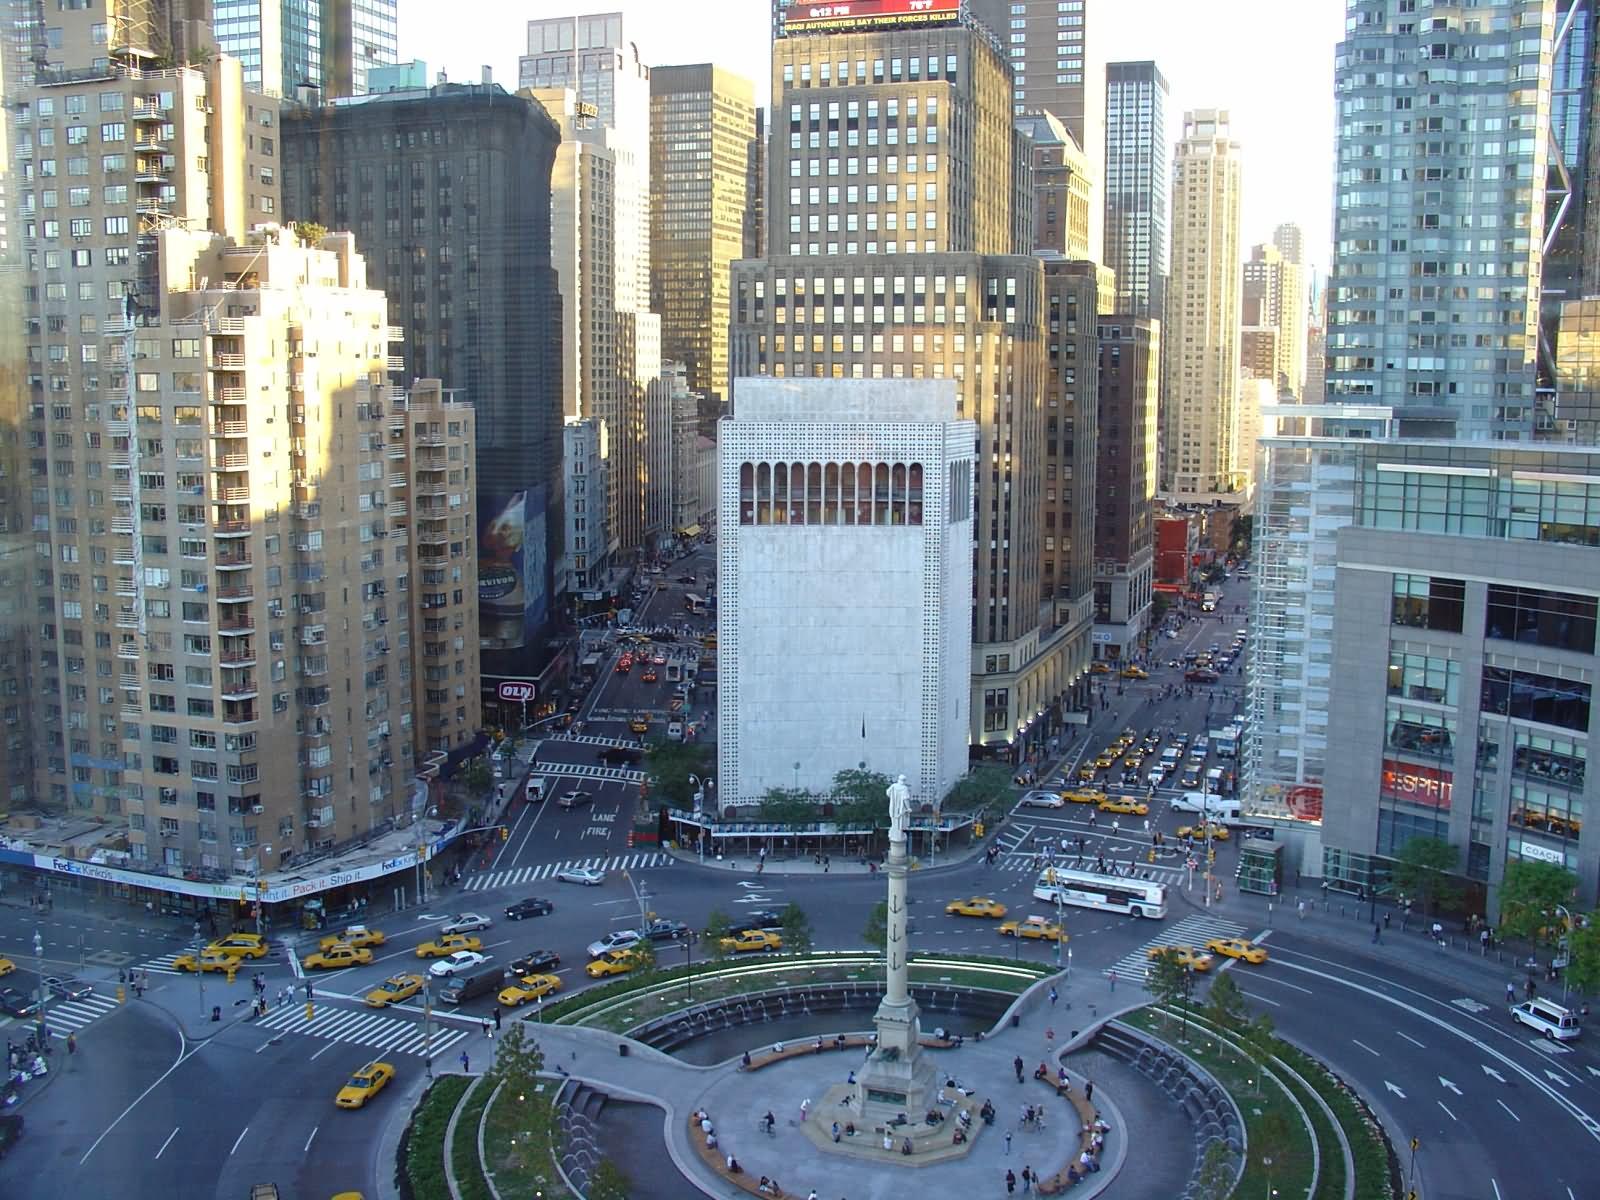 35 Incredible Columbus Circle Manhattan Pictures And Photos